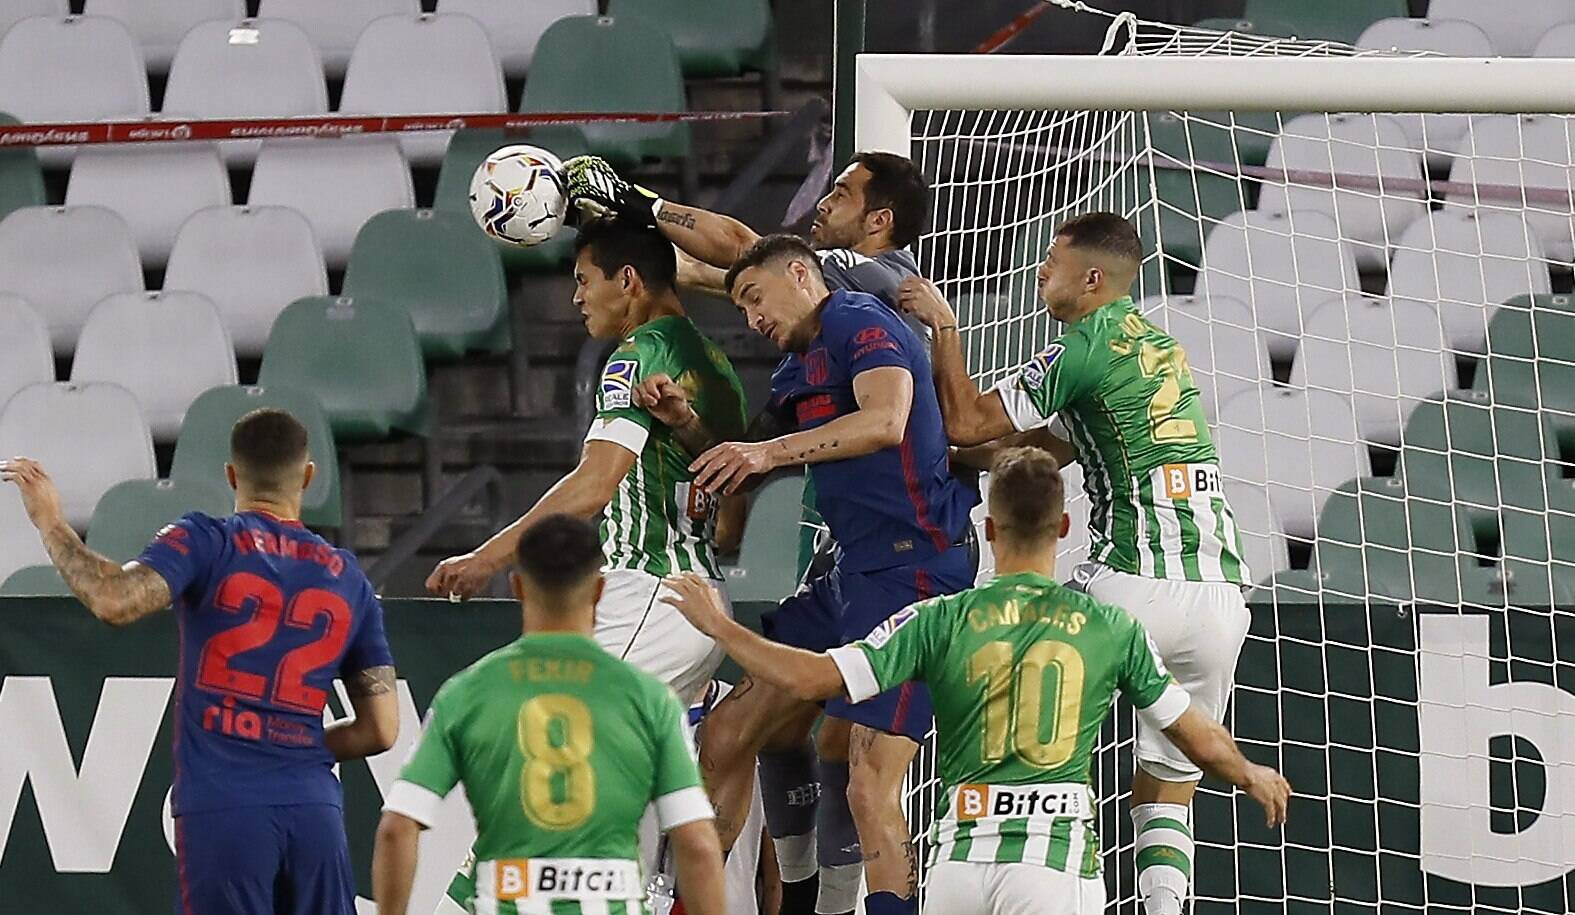 La Liga Vorschau Teil 3: Atletico, Real Betis, FC Cadiz, RCD Espanyol